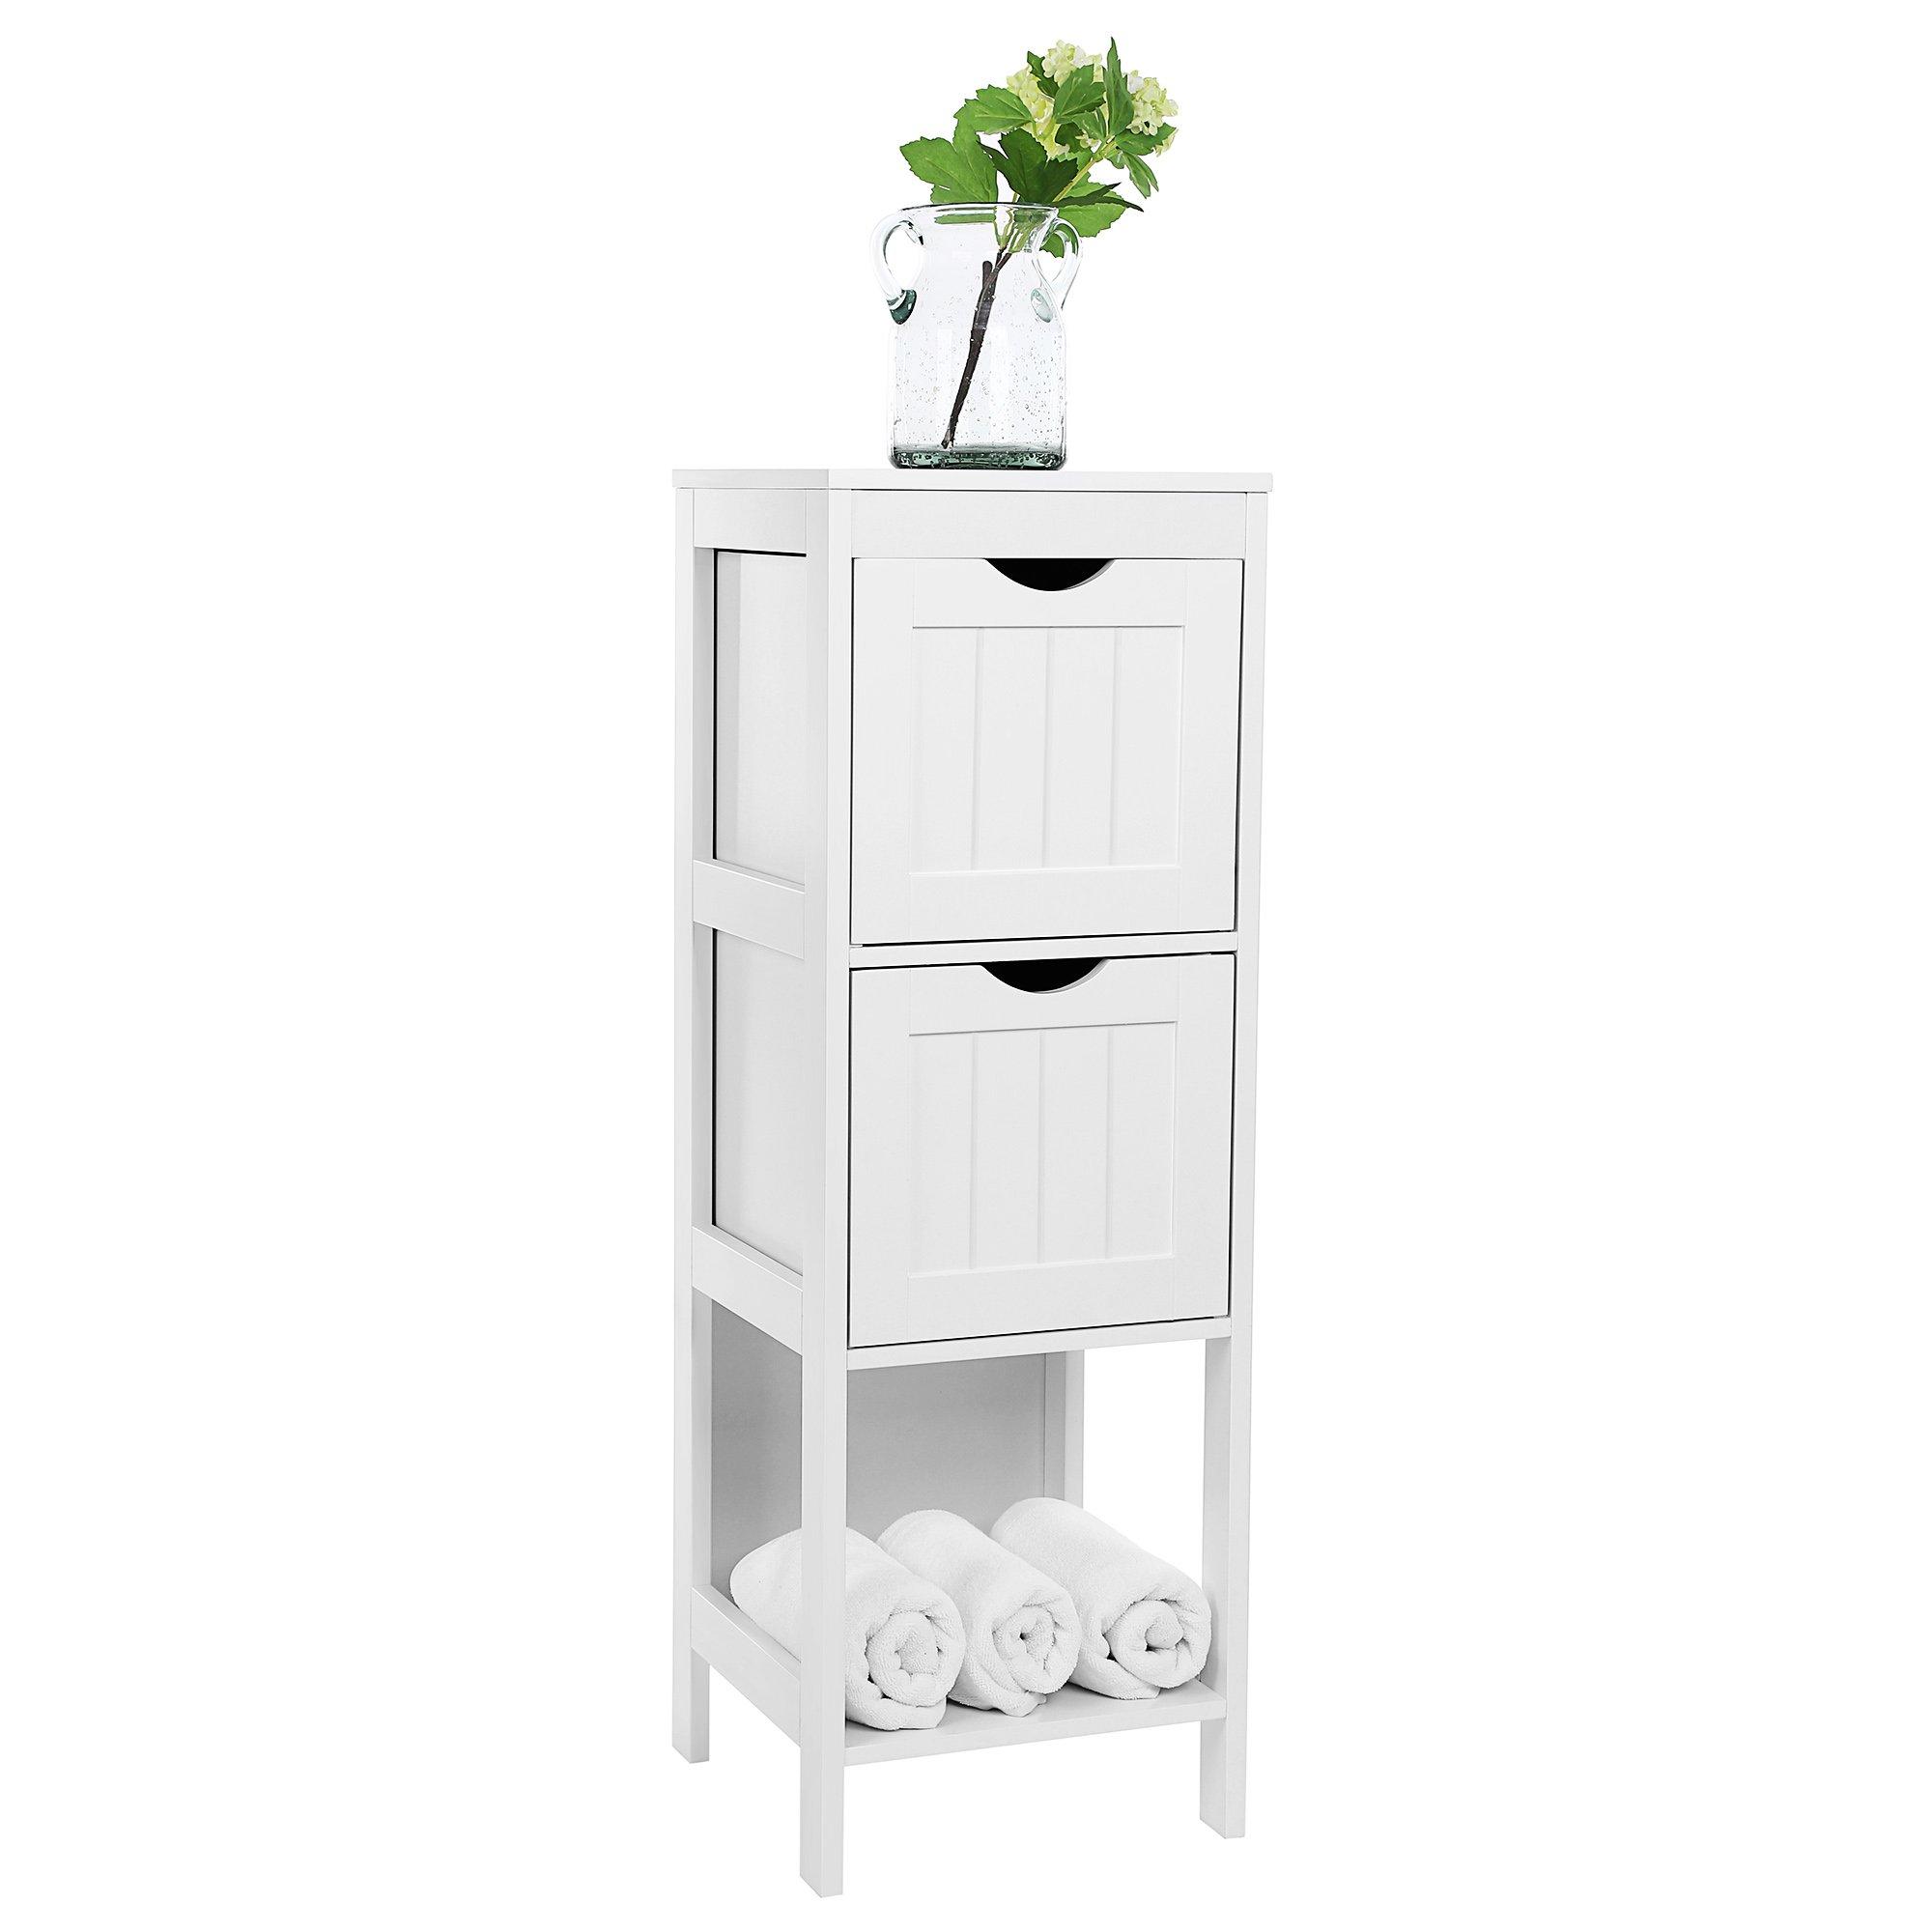 VASAGLE UBBC42WT Floor Cabinet Multifunctional Bathroom Storage Organizer Rack Stand, 2 Drawers, White